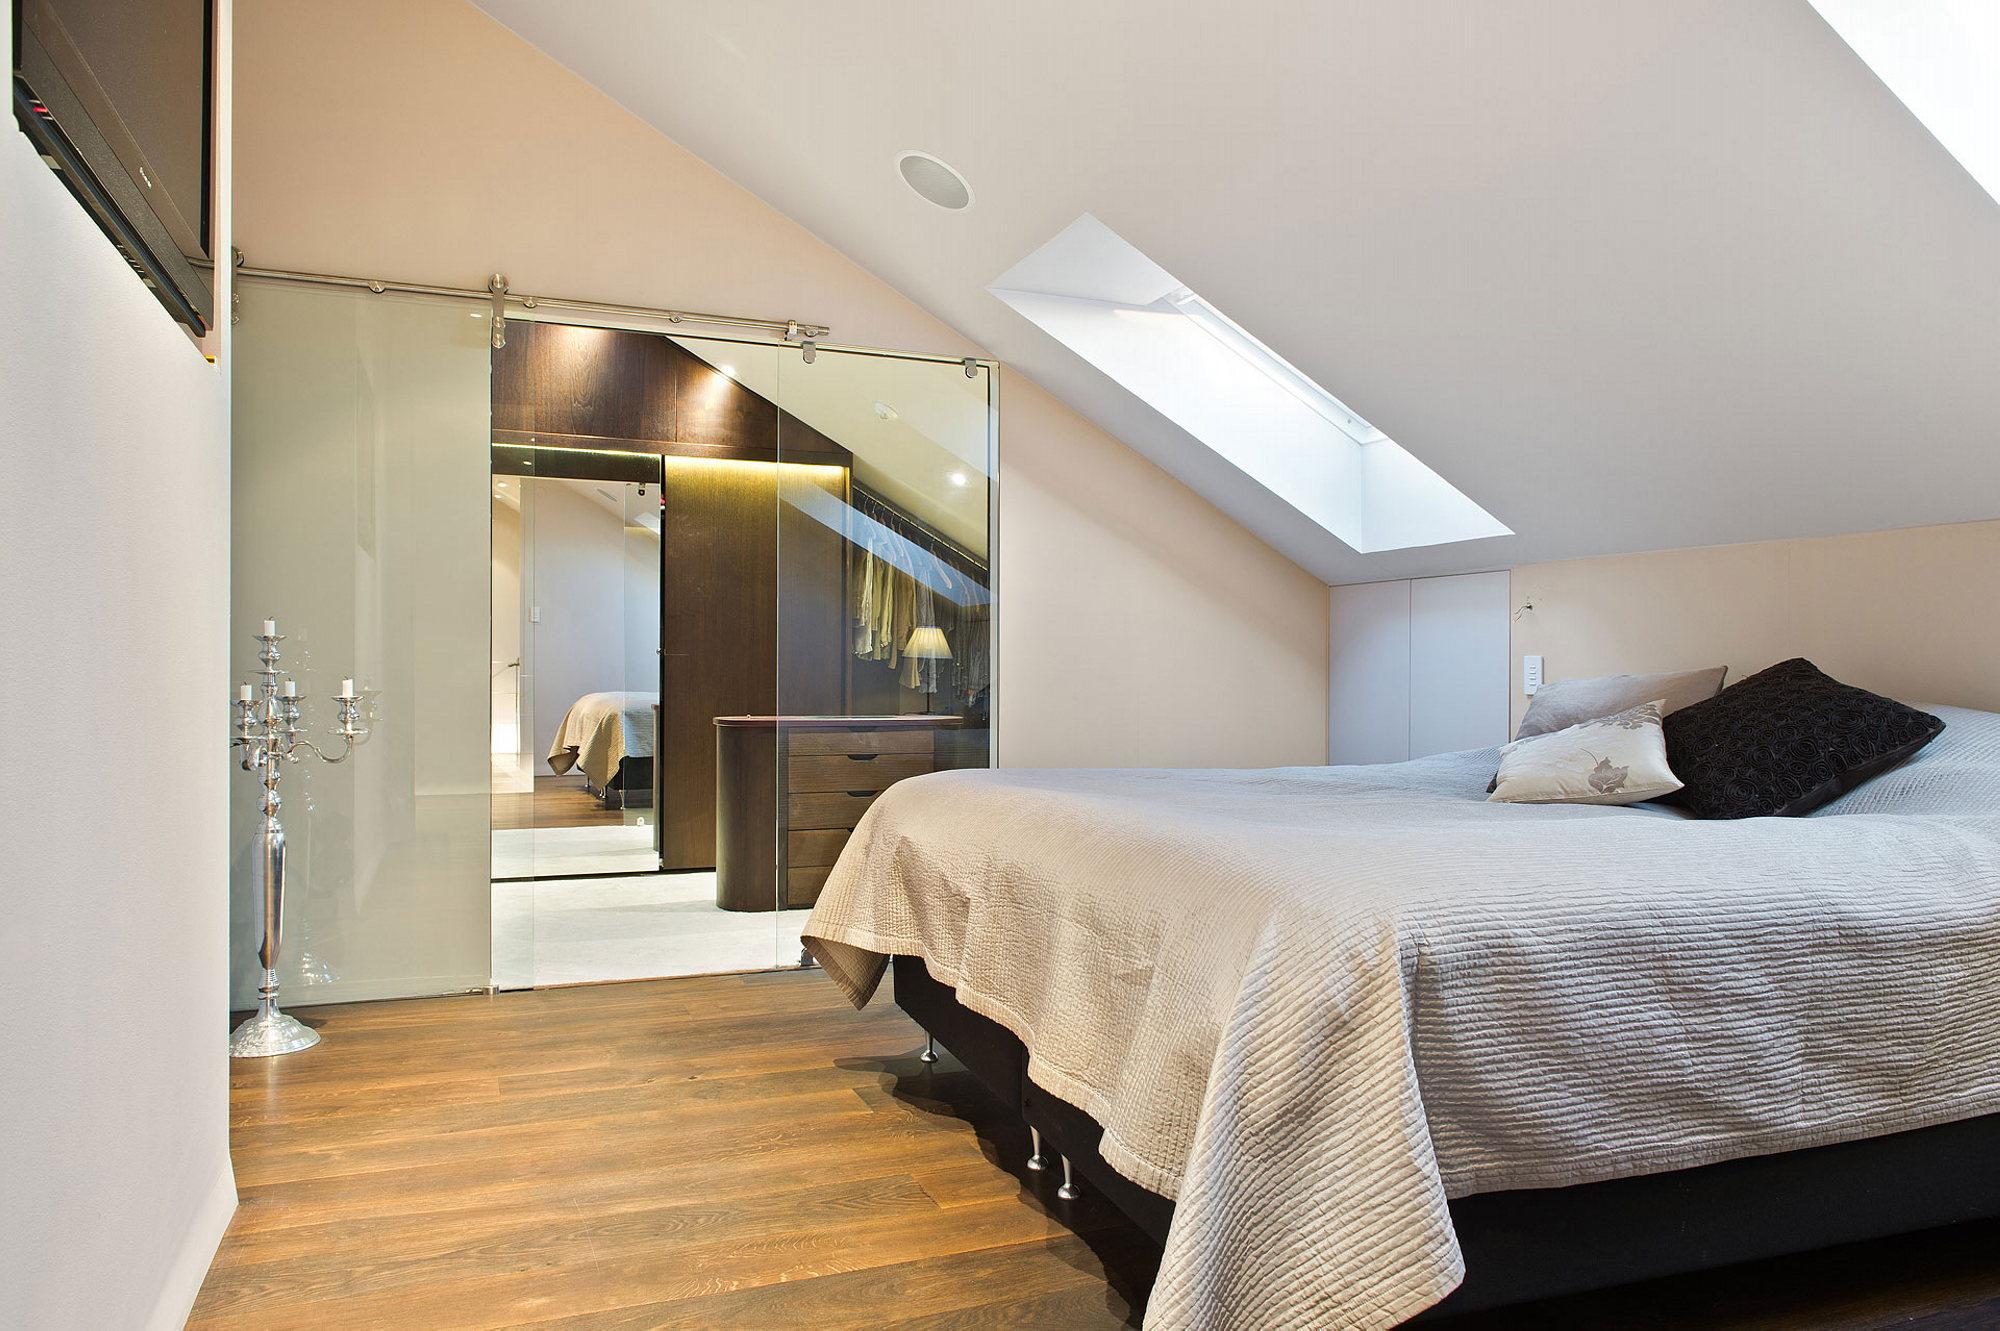 Fullsize Of Square Bedroom Design